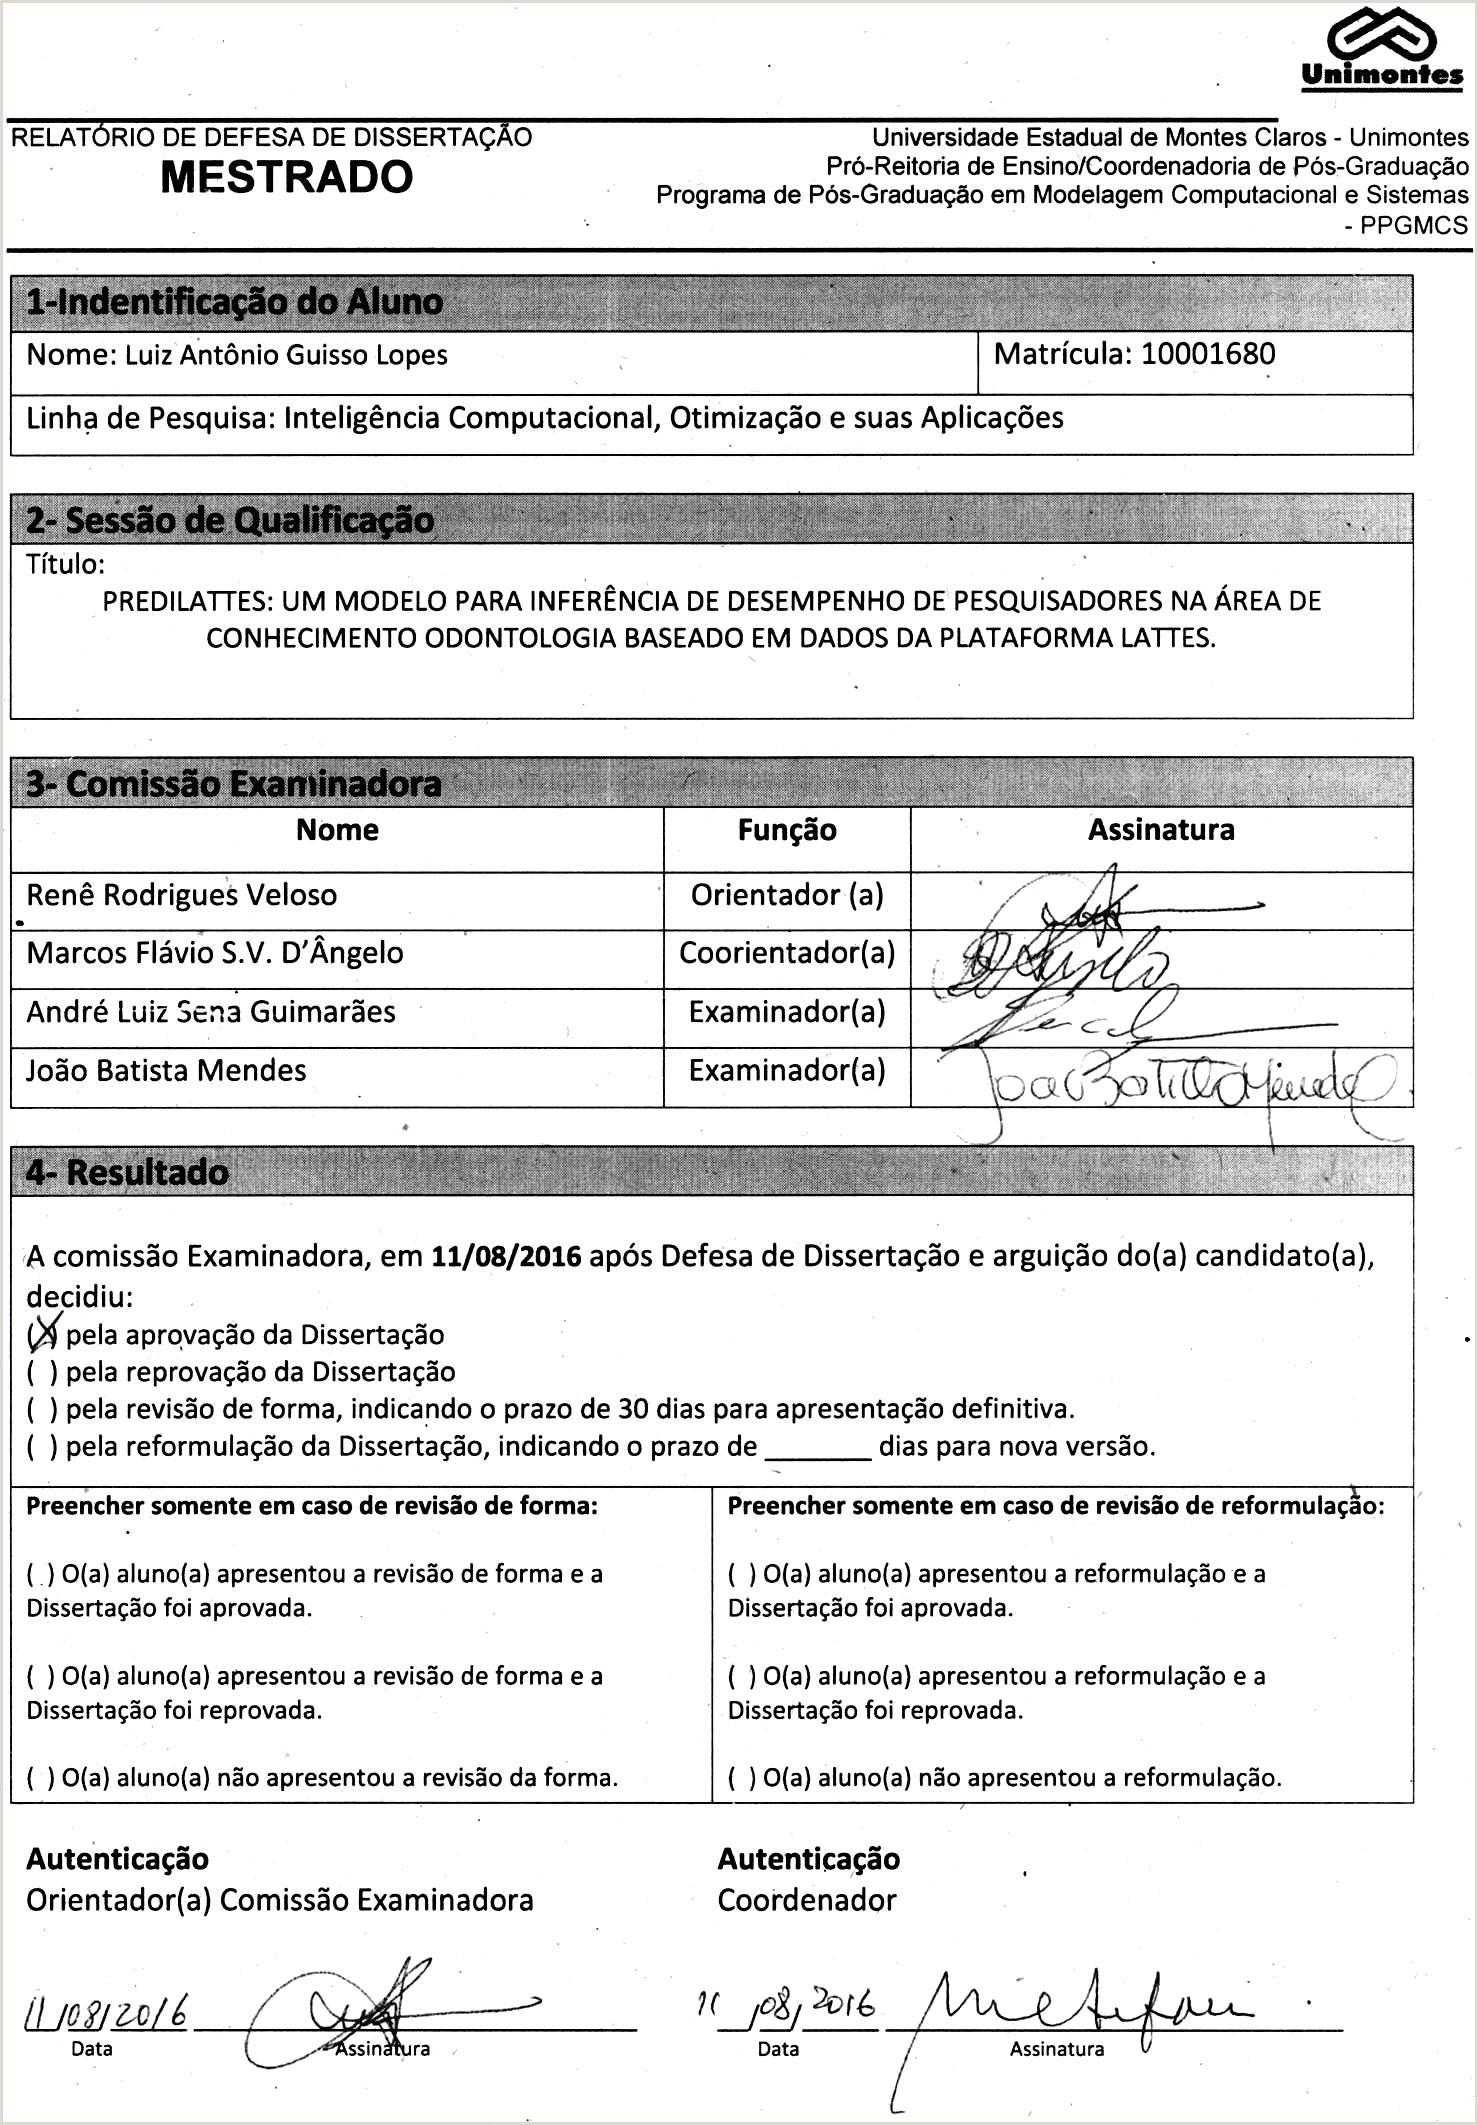 Luis Ant´nio Guisso Lopes PDF